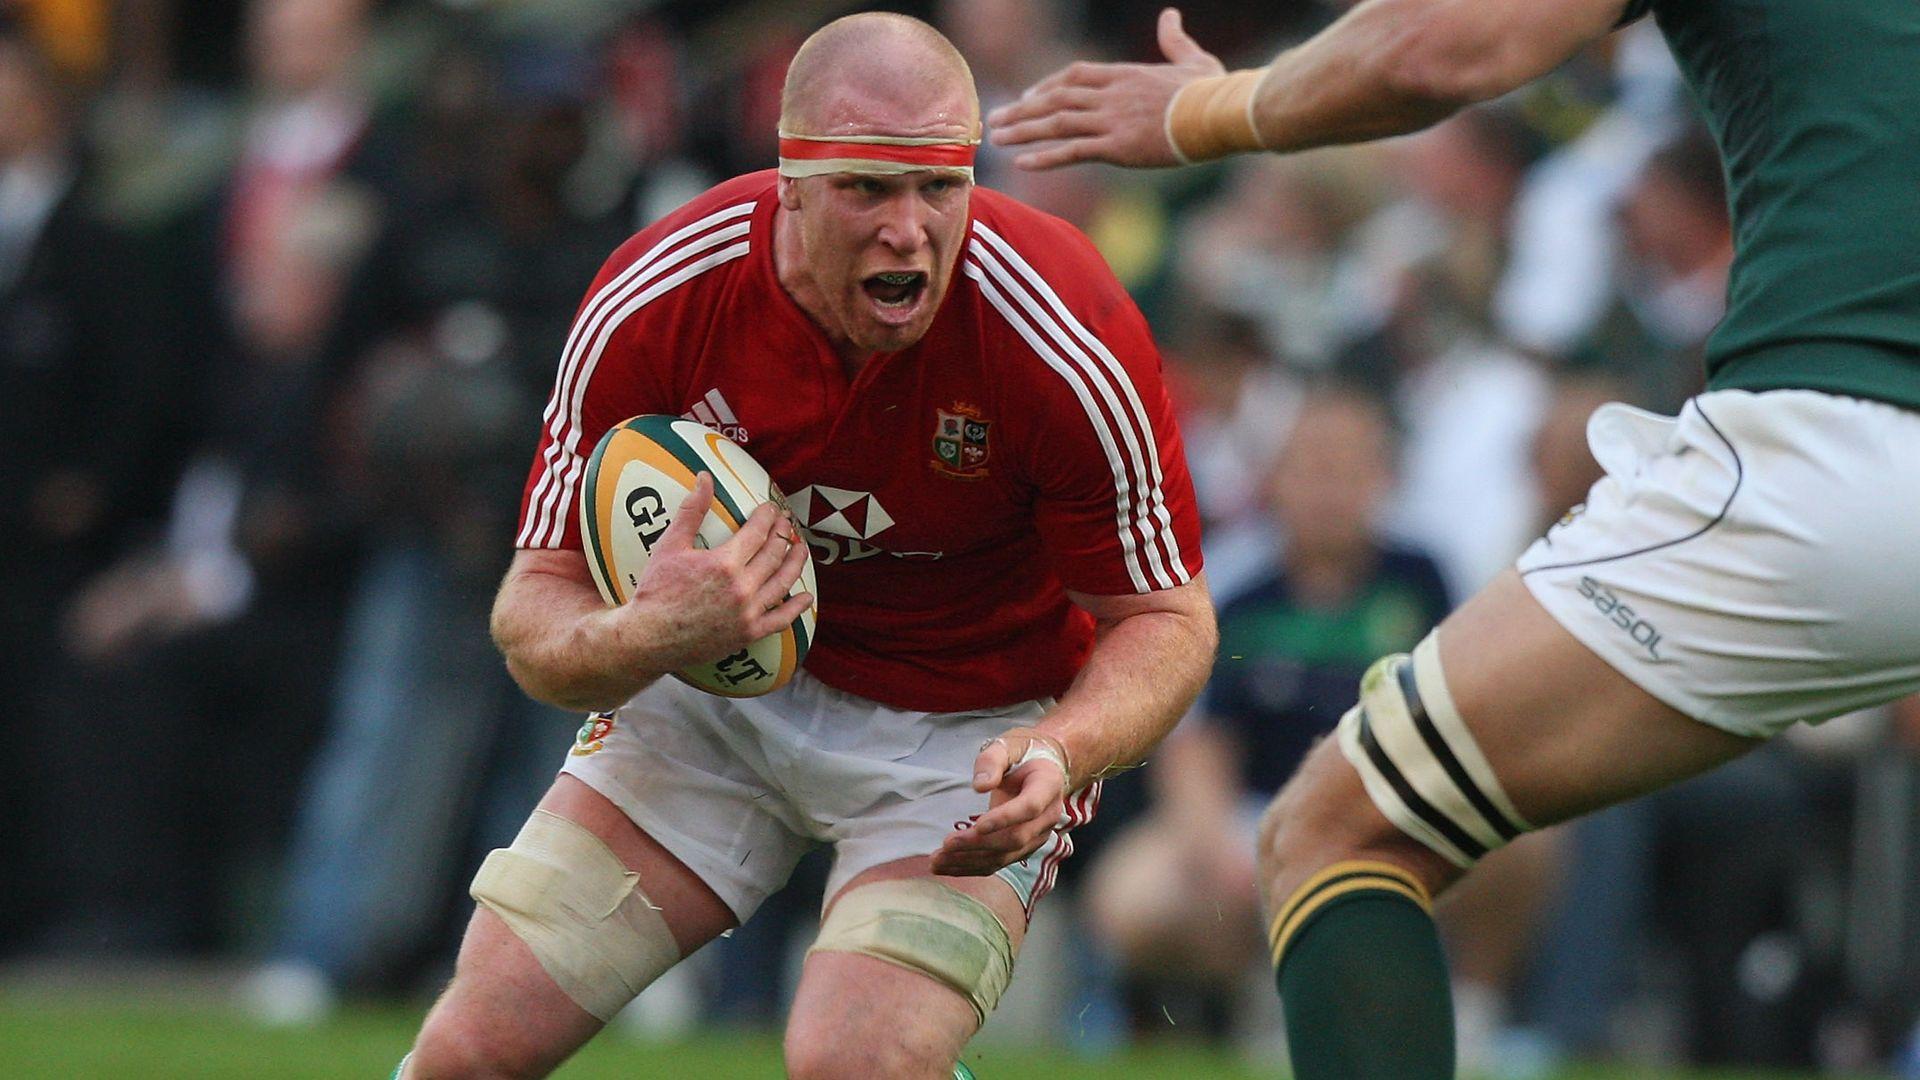 'Lions need abrasive captain'